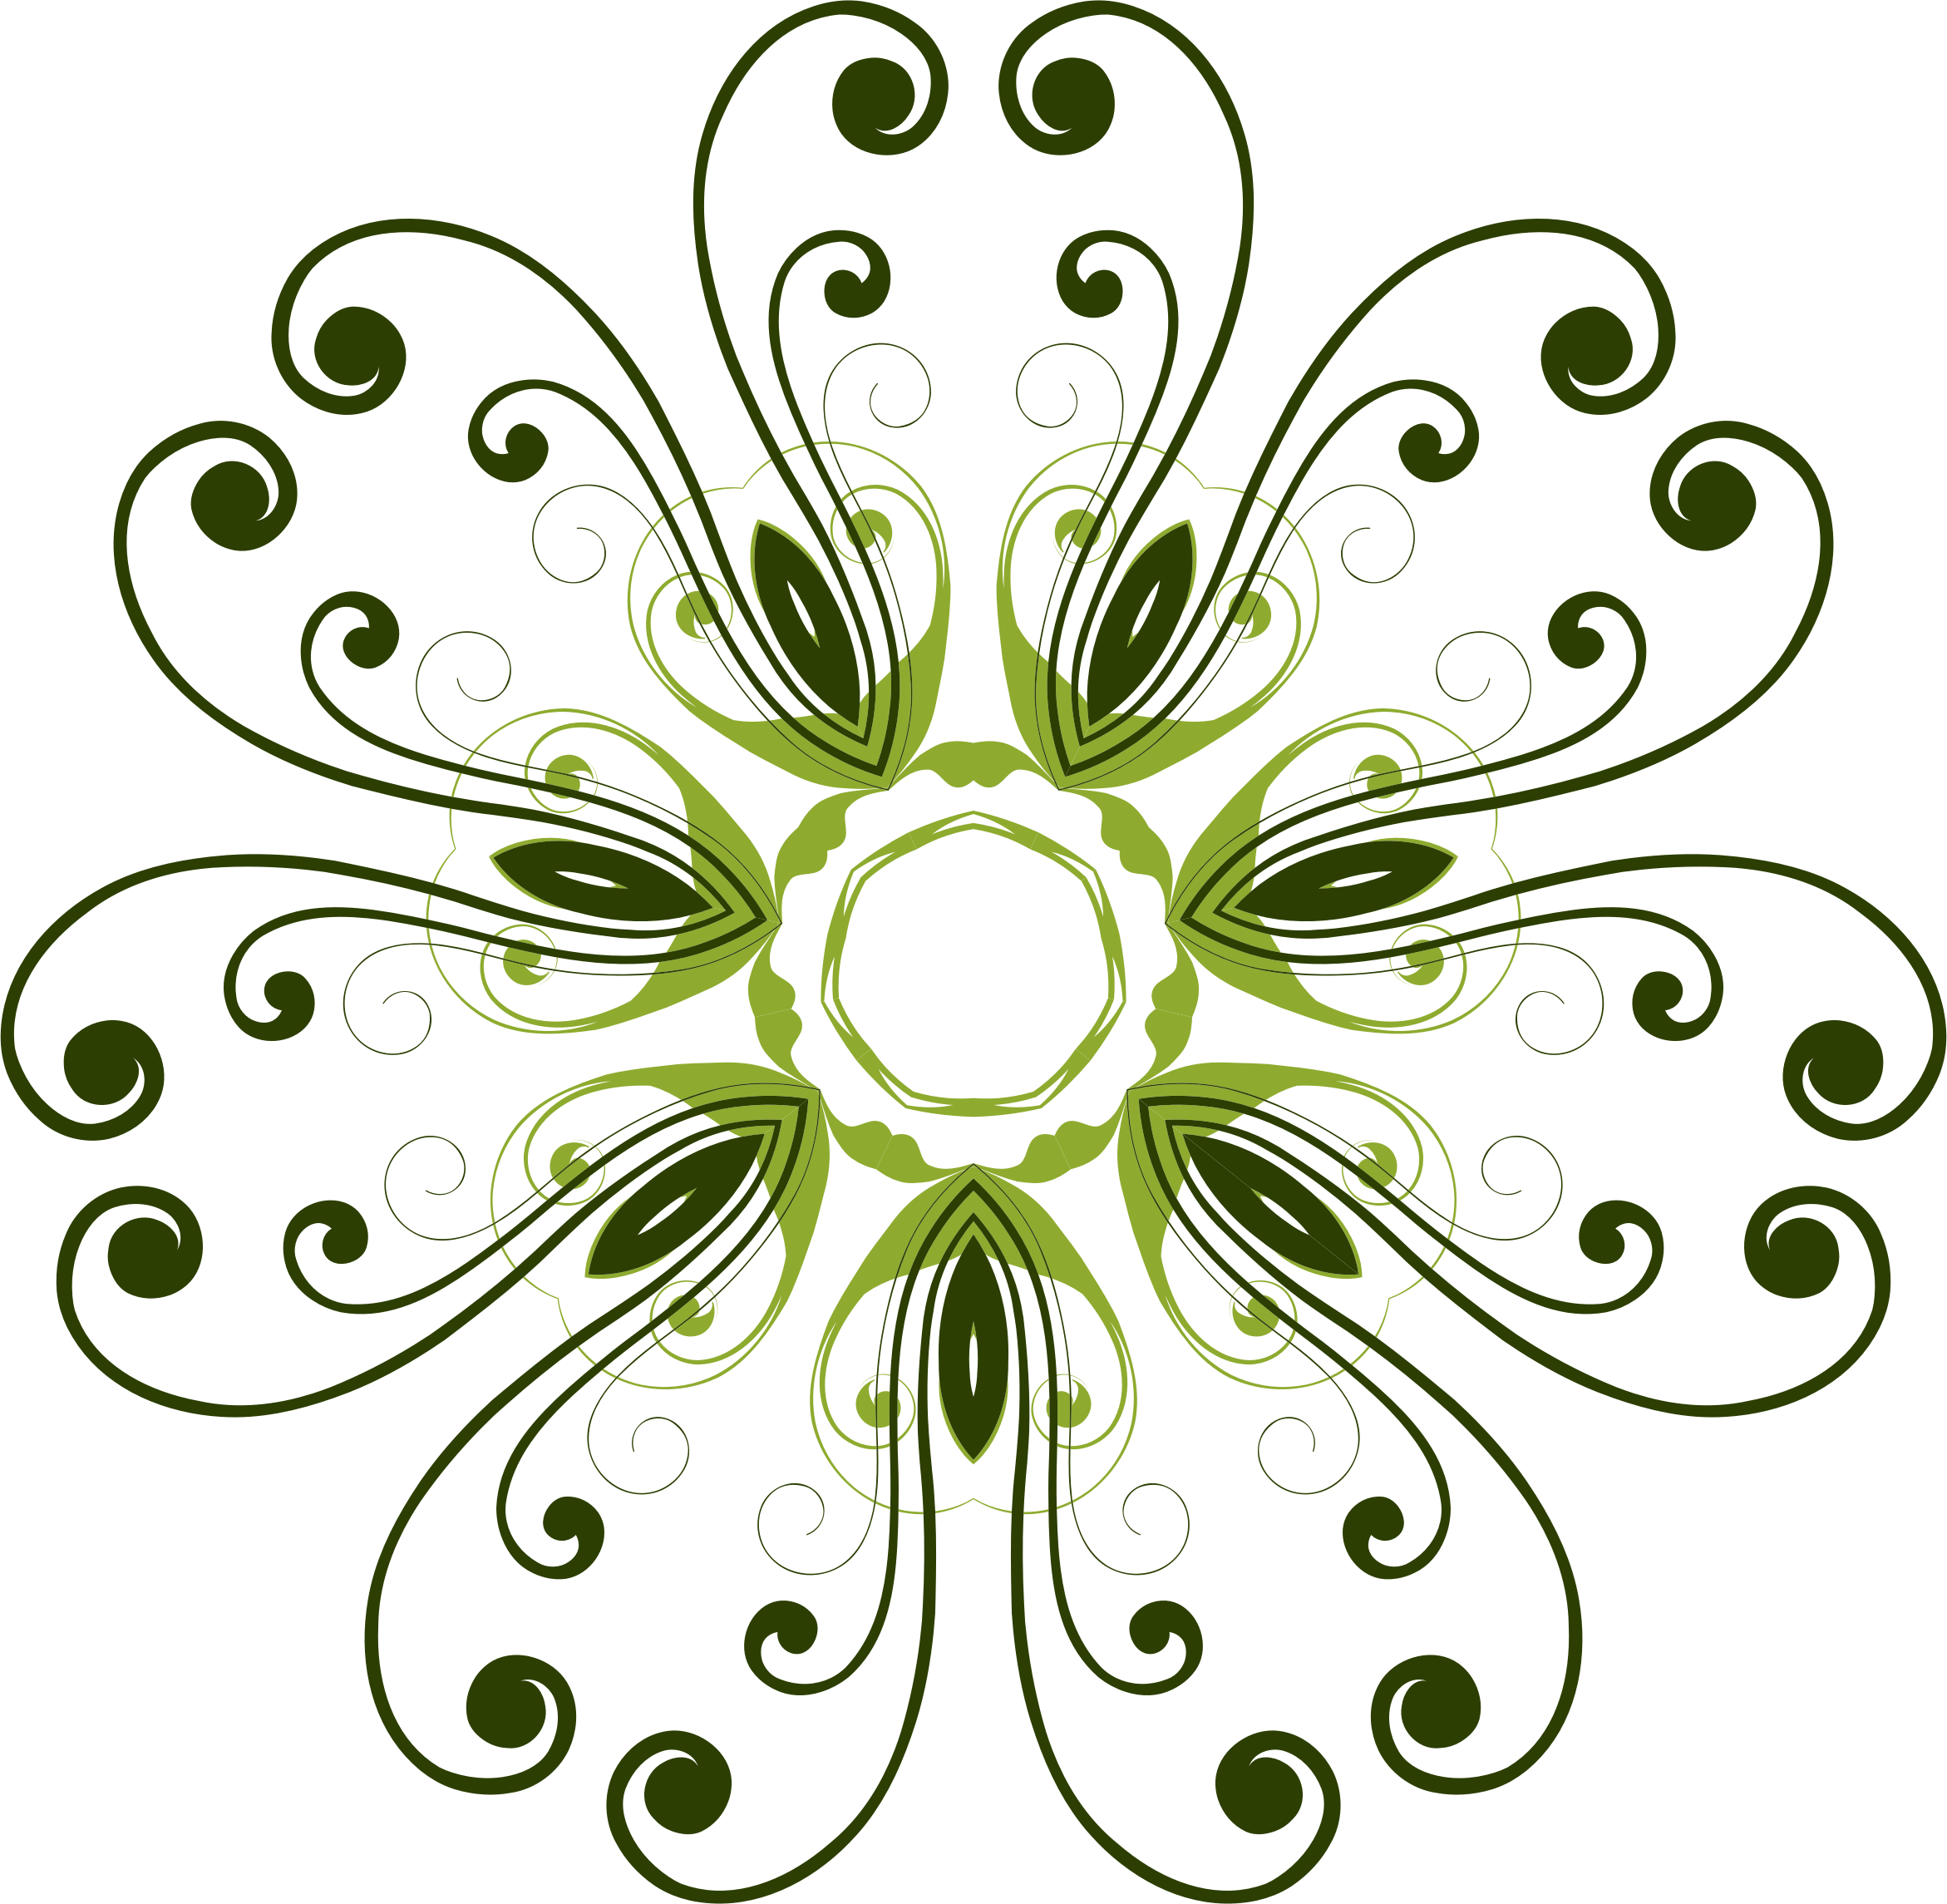 Clipart flower design jpg transparent stock Clipart - Flourish Flower Design jpg transparent stock